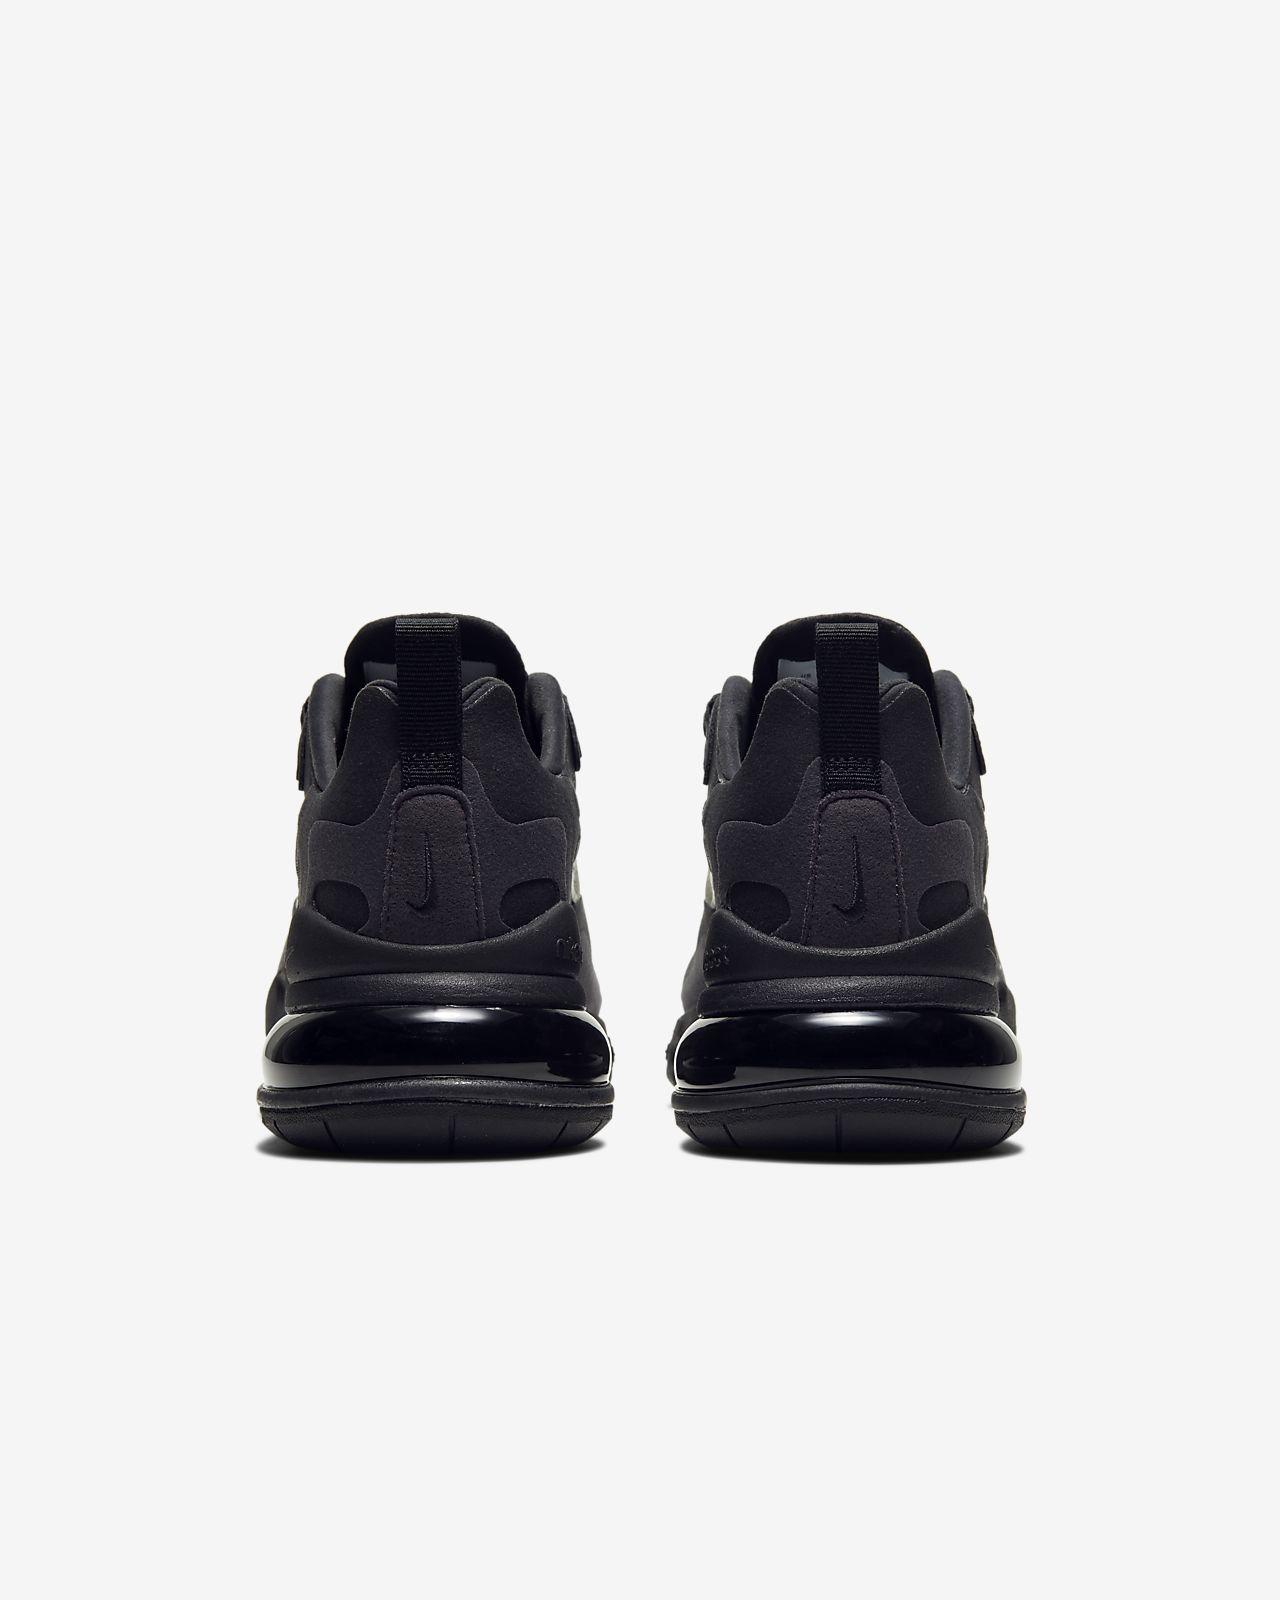 Nike MD Runner 2 breathe W noire Chaussures Baskets femme